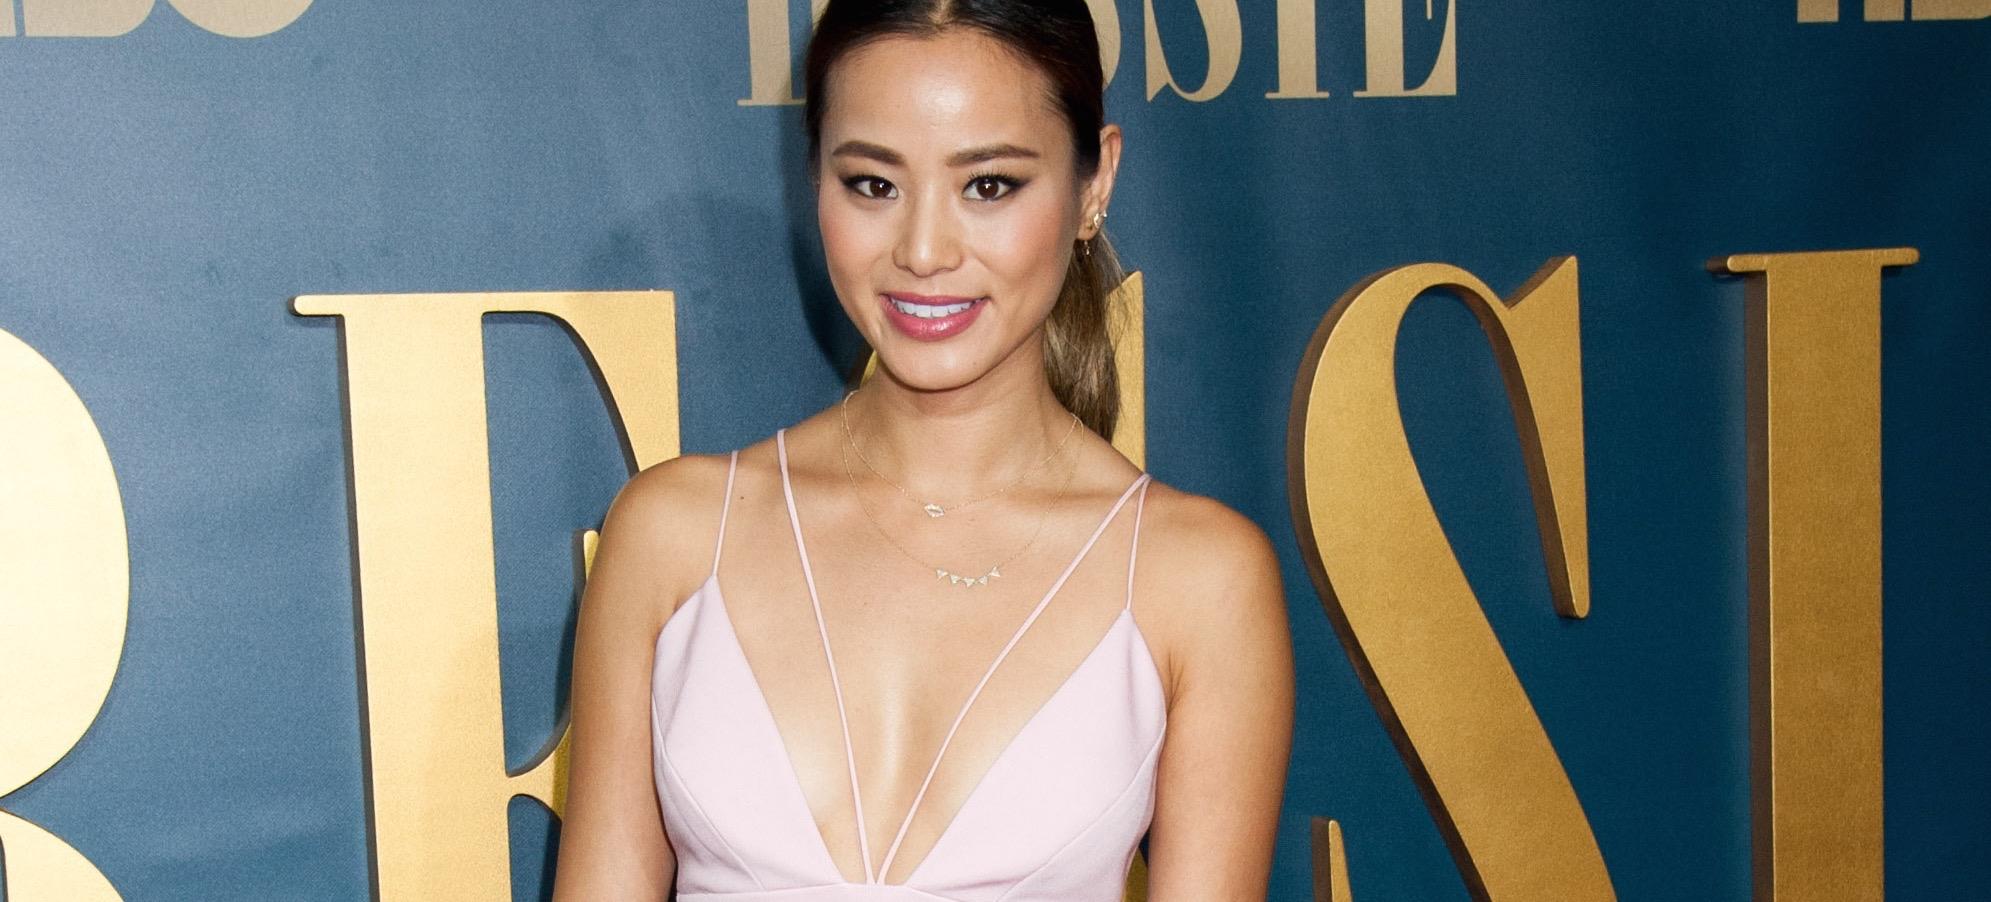 Jamie Chung Shares Her Save vs. Splurge Fall Shopping List